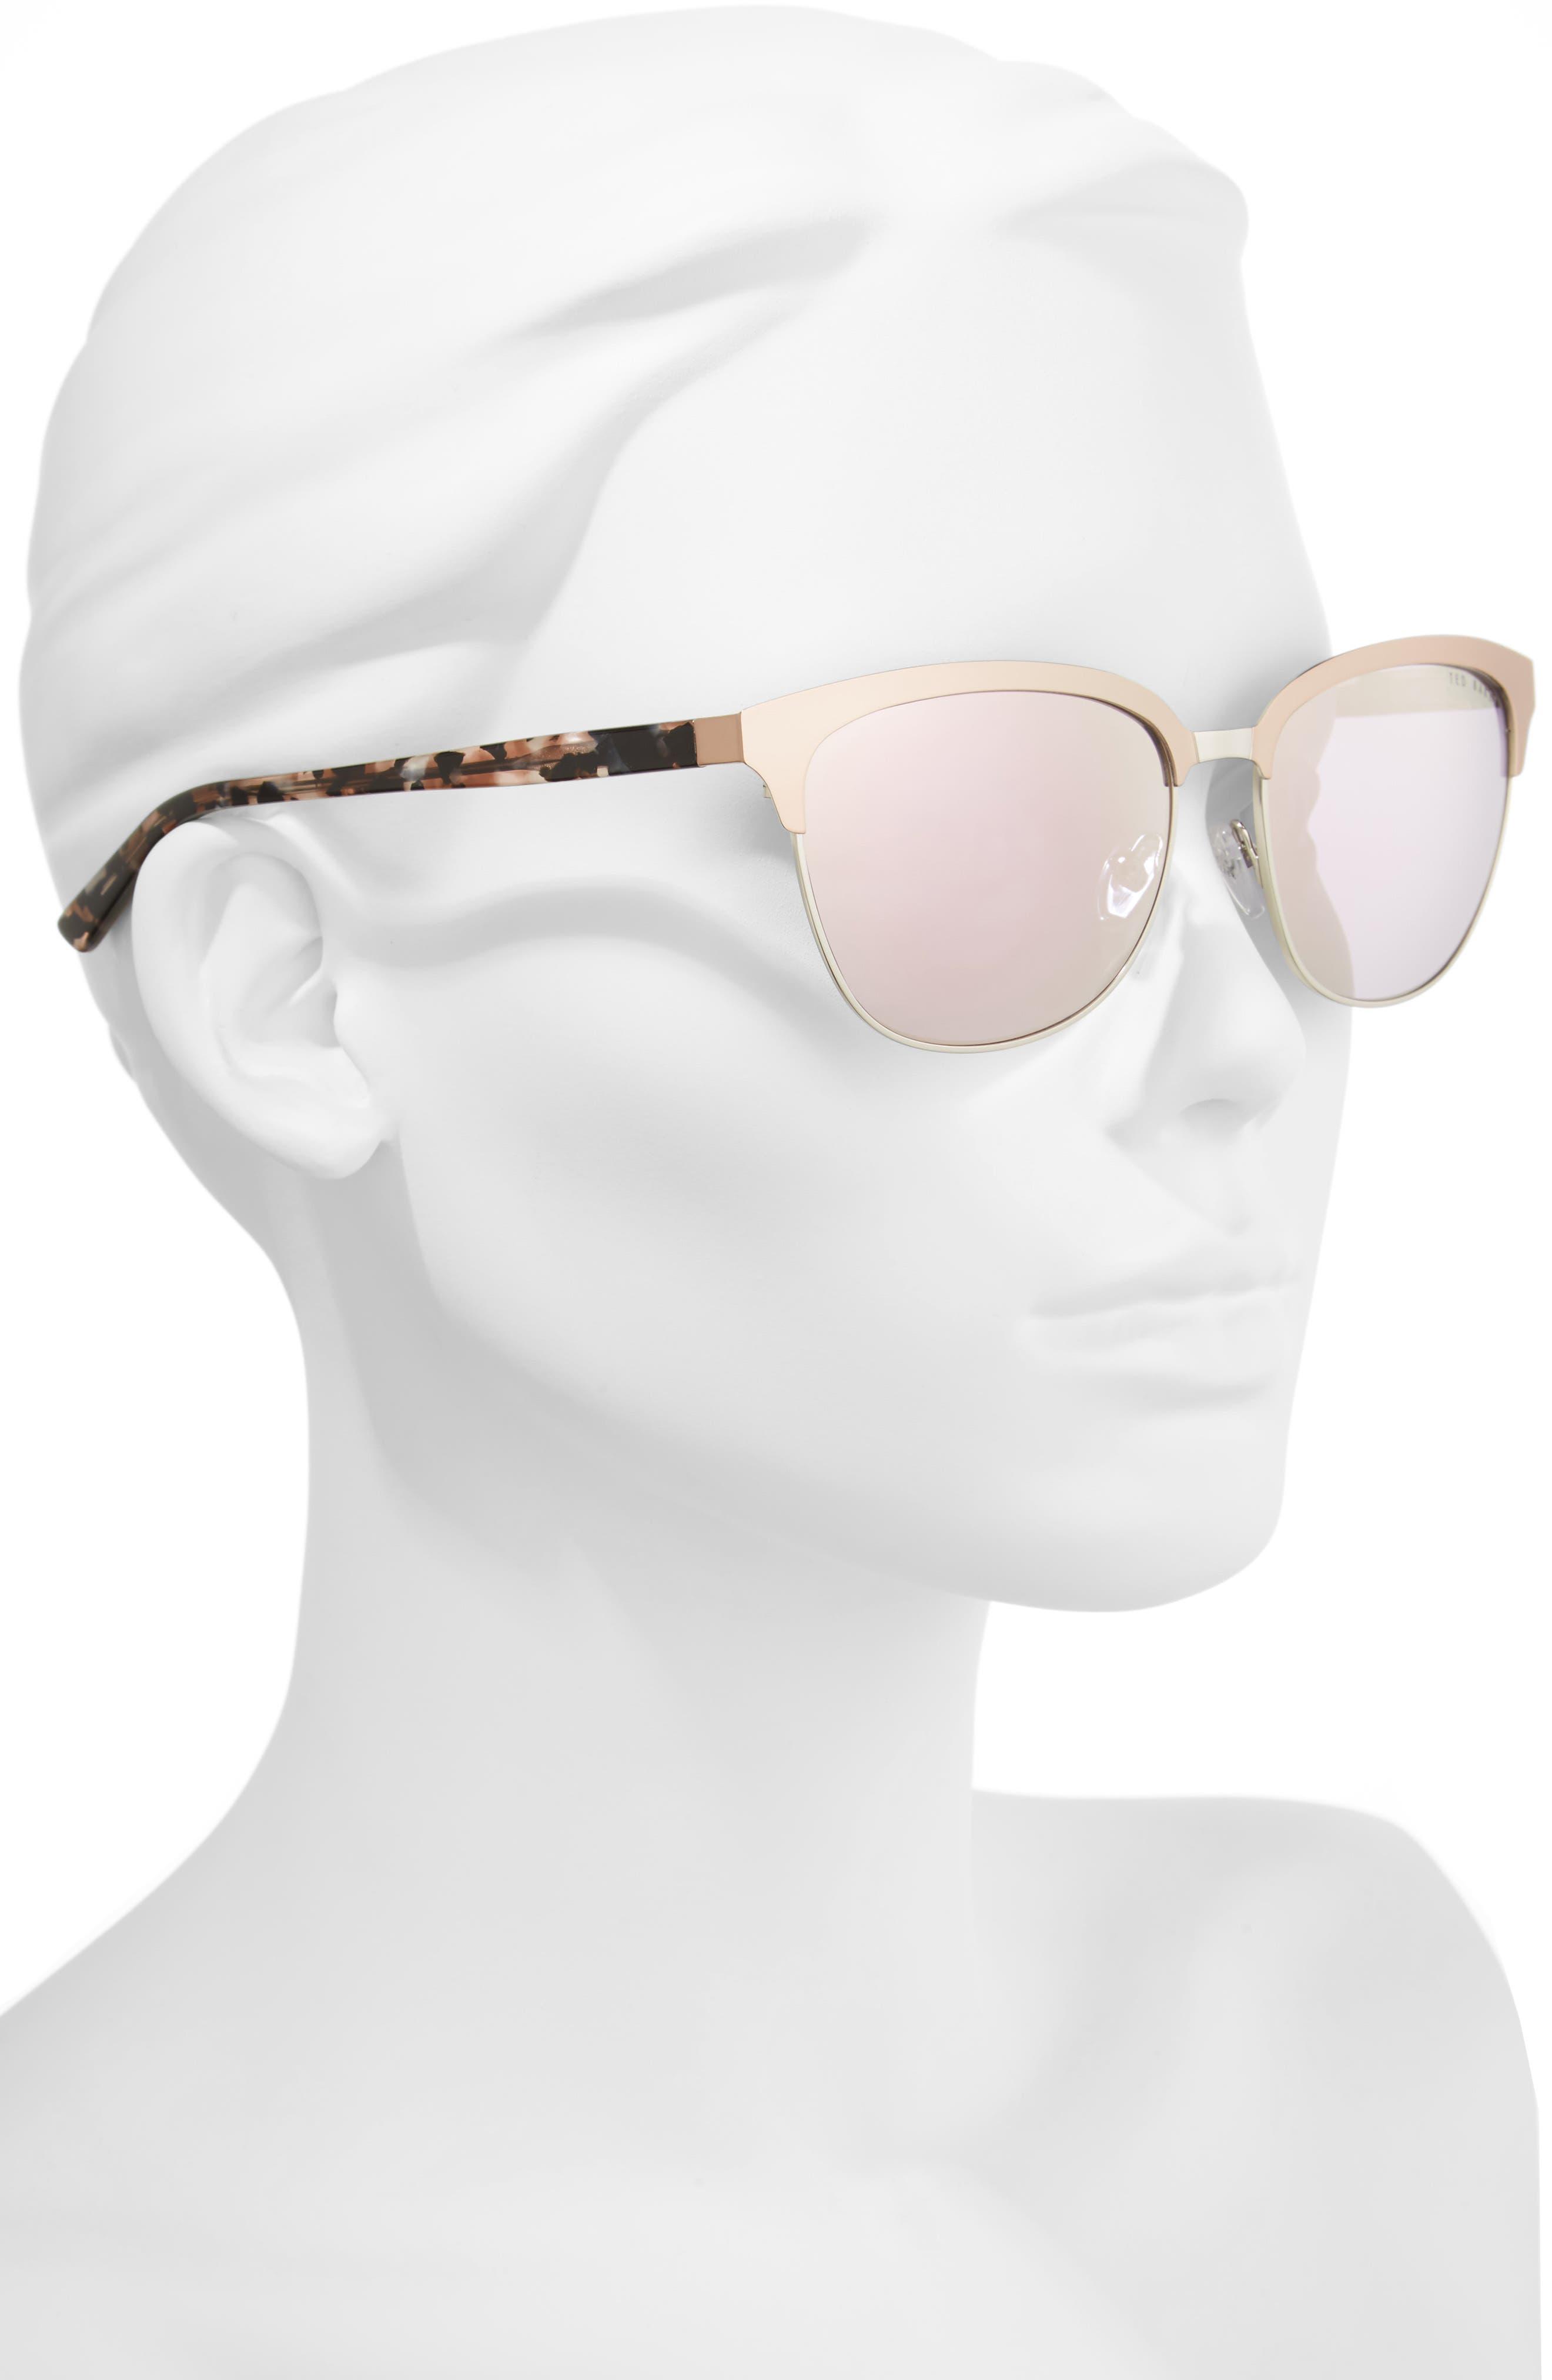 Alternate Image 2  - Ted Baker London 57mm Mirrored Sunglasses